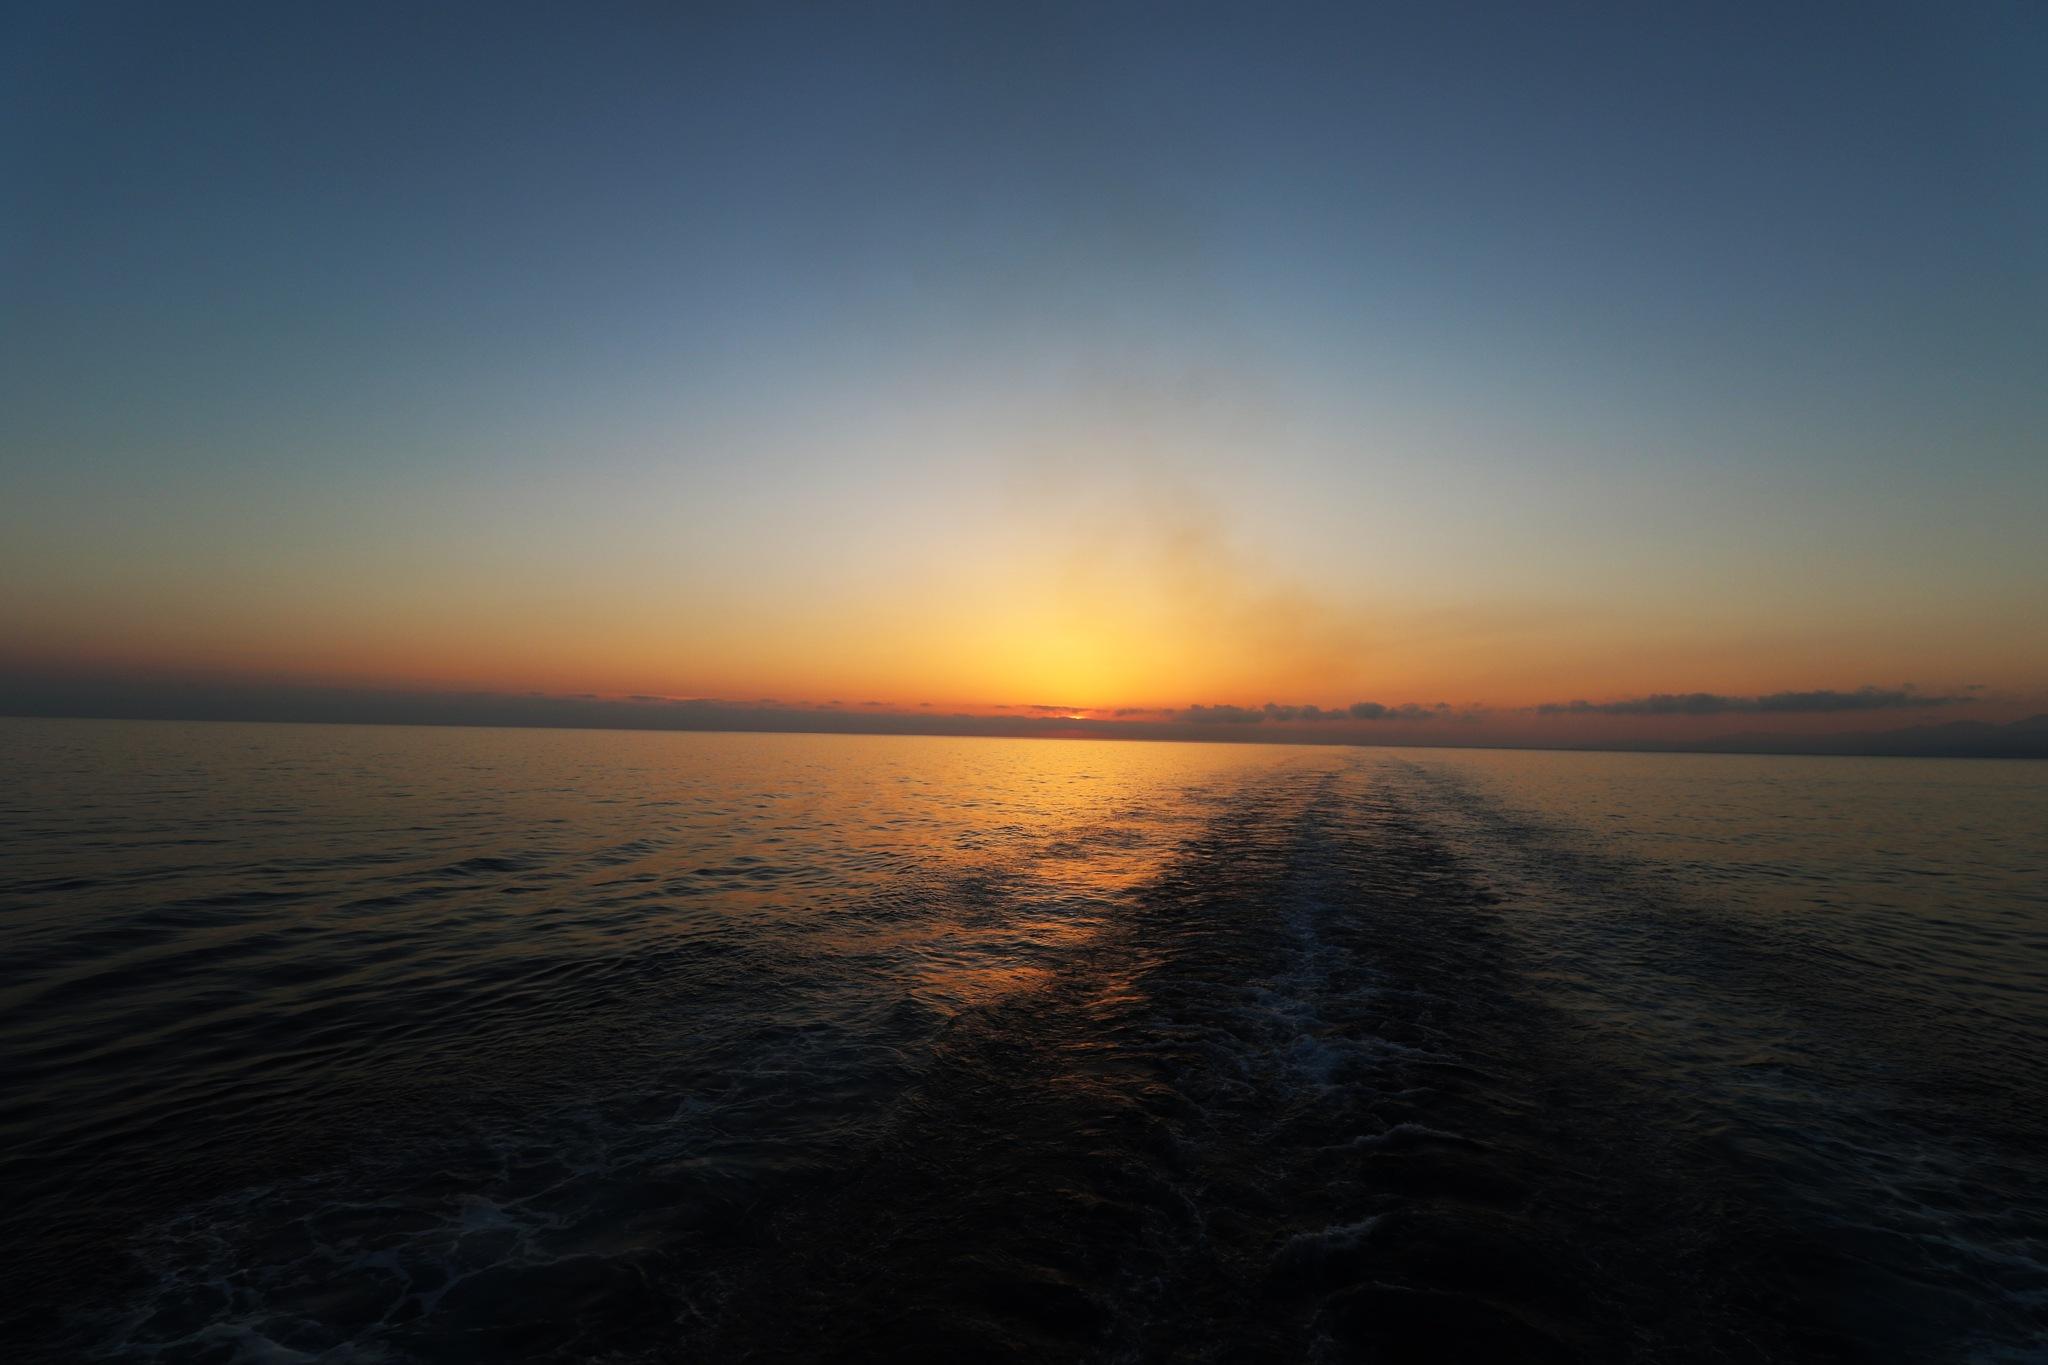 Sunrise above the sea by ITZIK YOTVAT